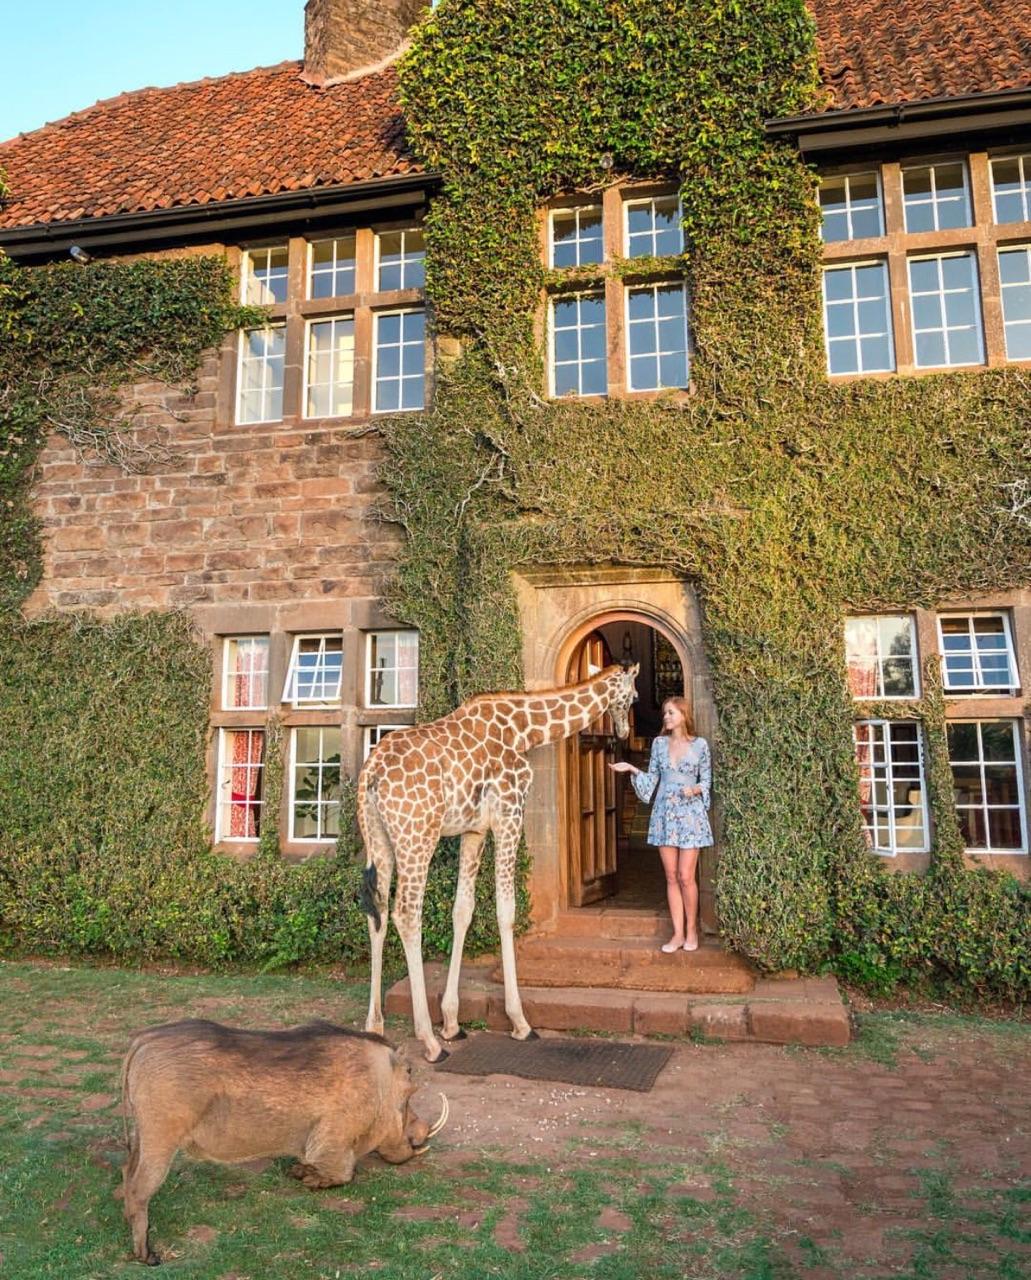 2018 Travel Bucket List: Kenya